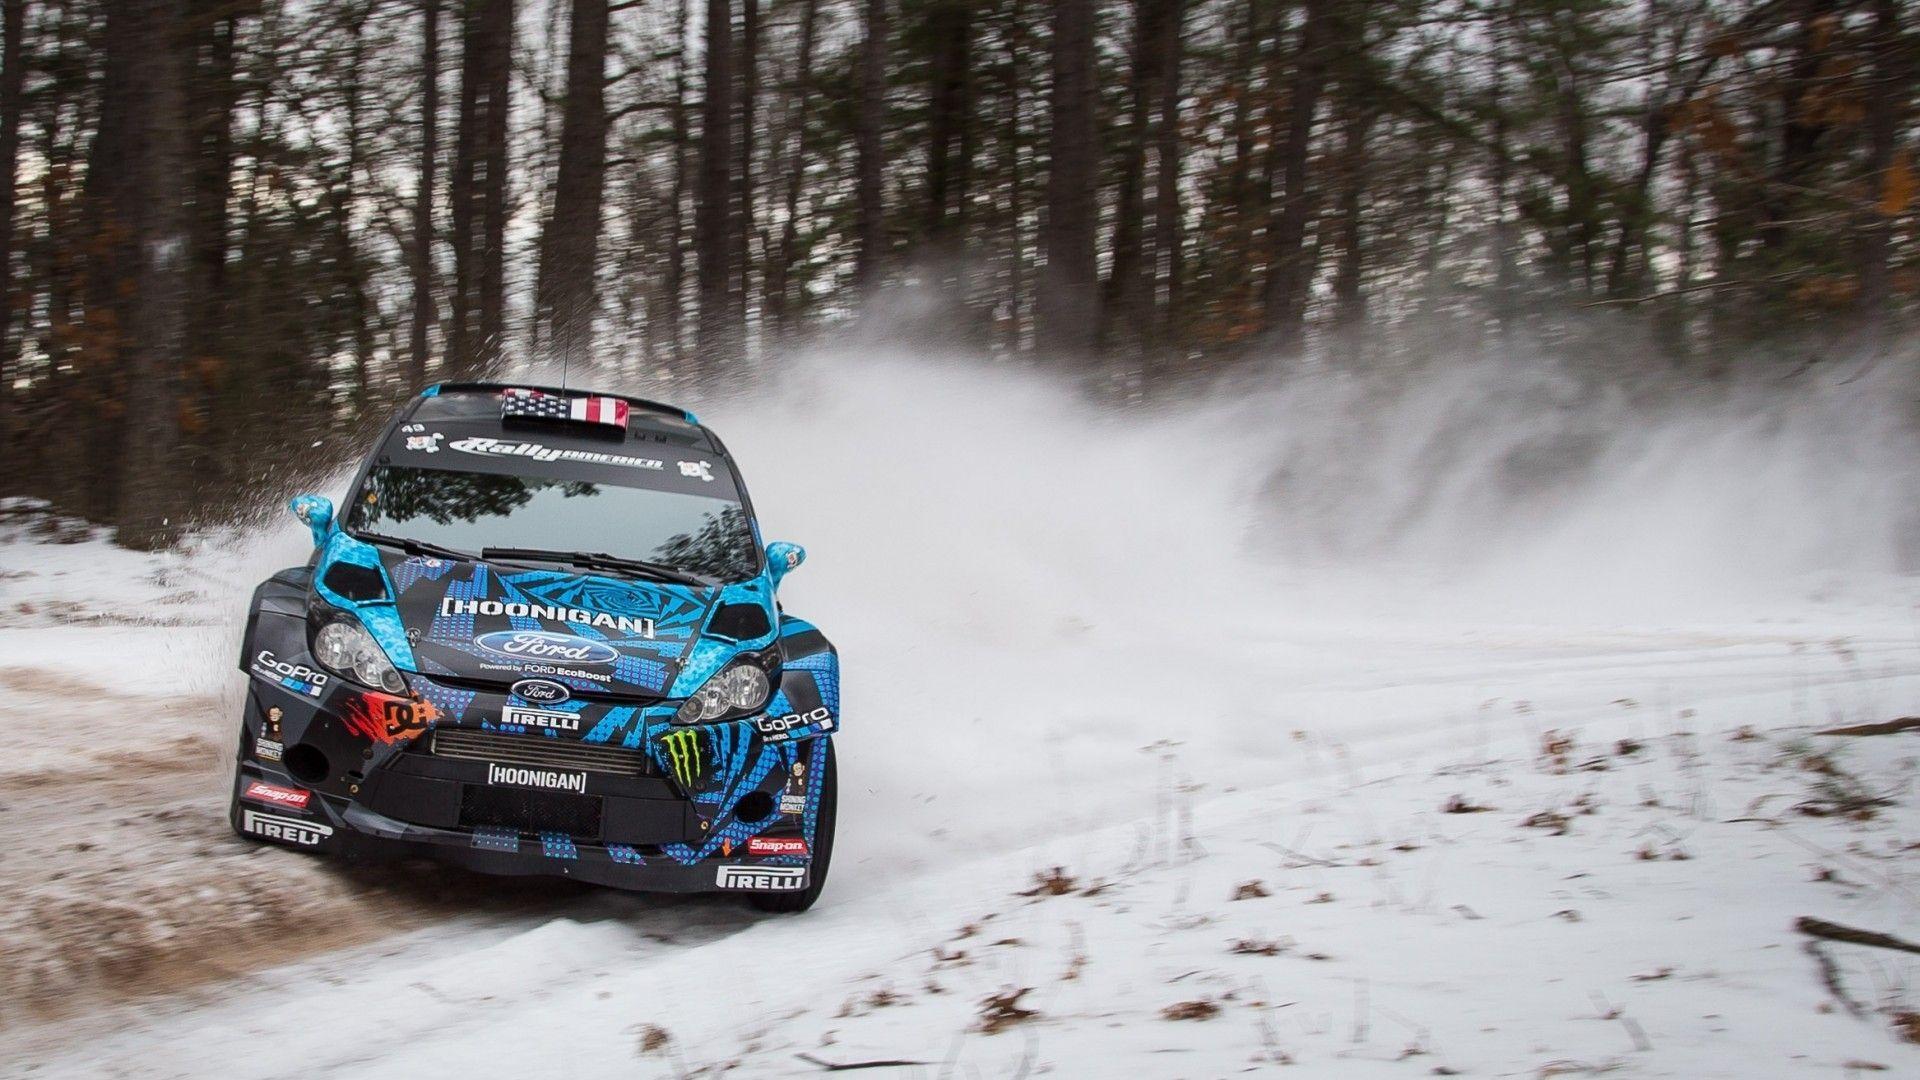 Rally Racing Wallpapers Top Free Rally Racing Backgrounds